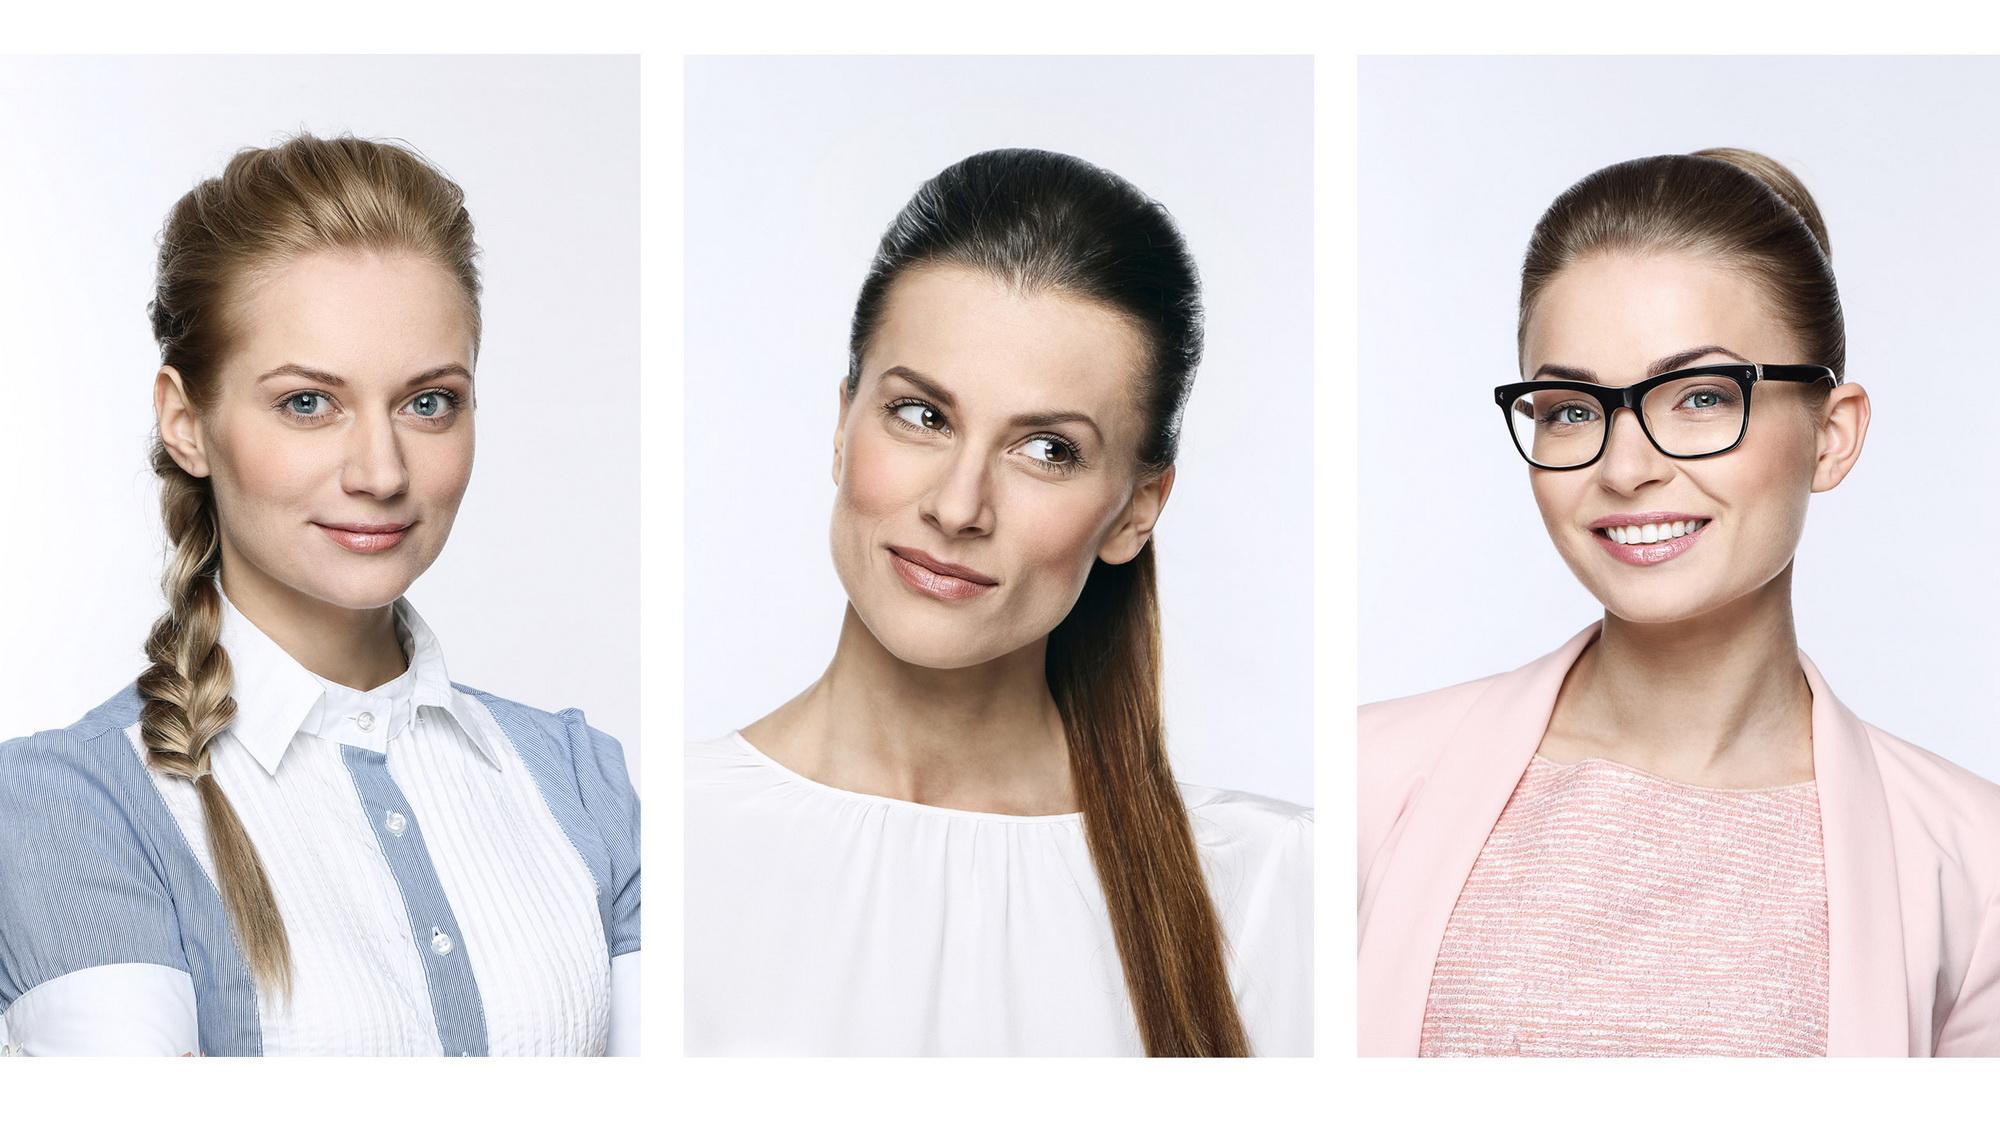 Kommunarka Portraits